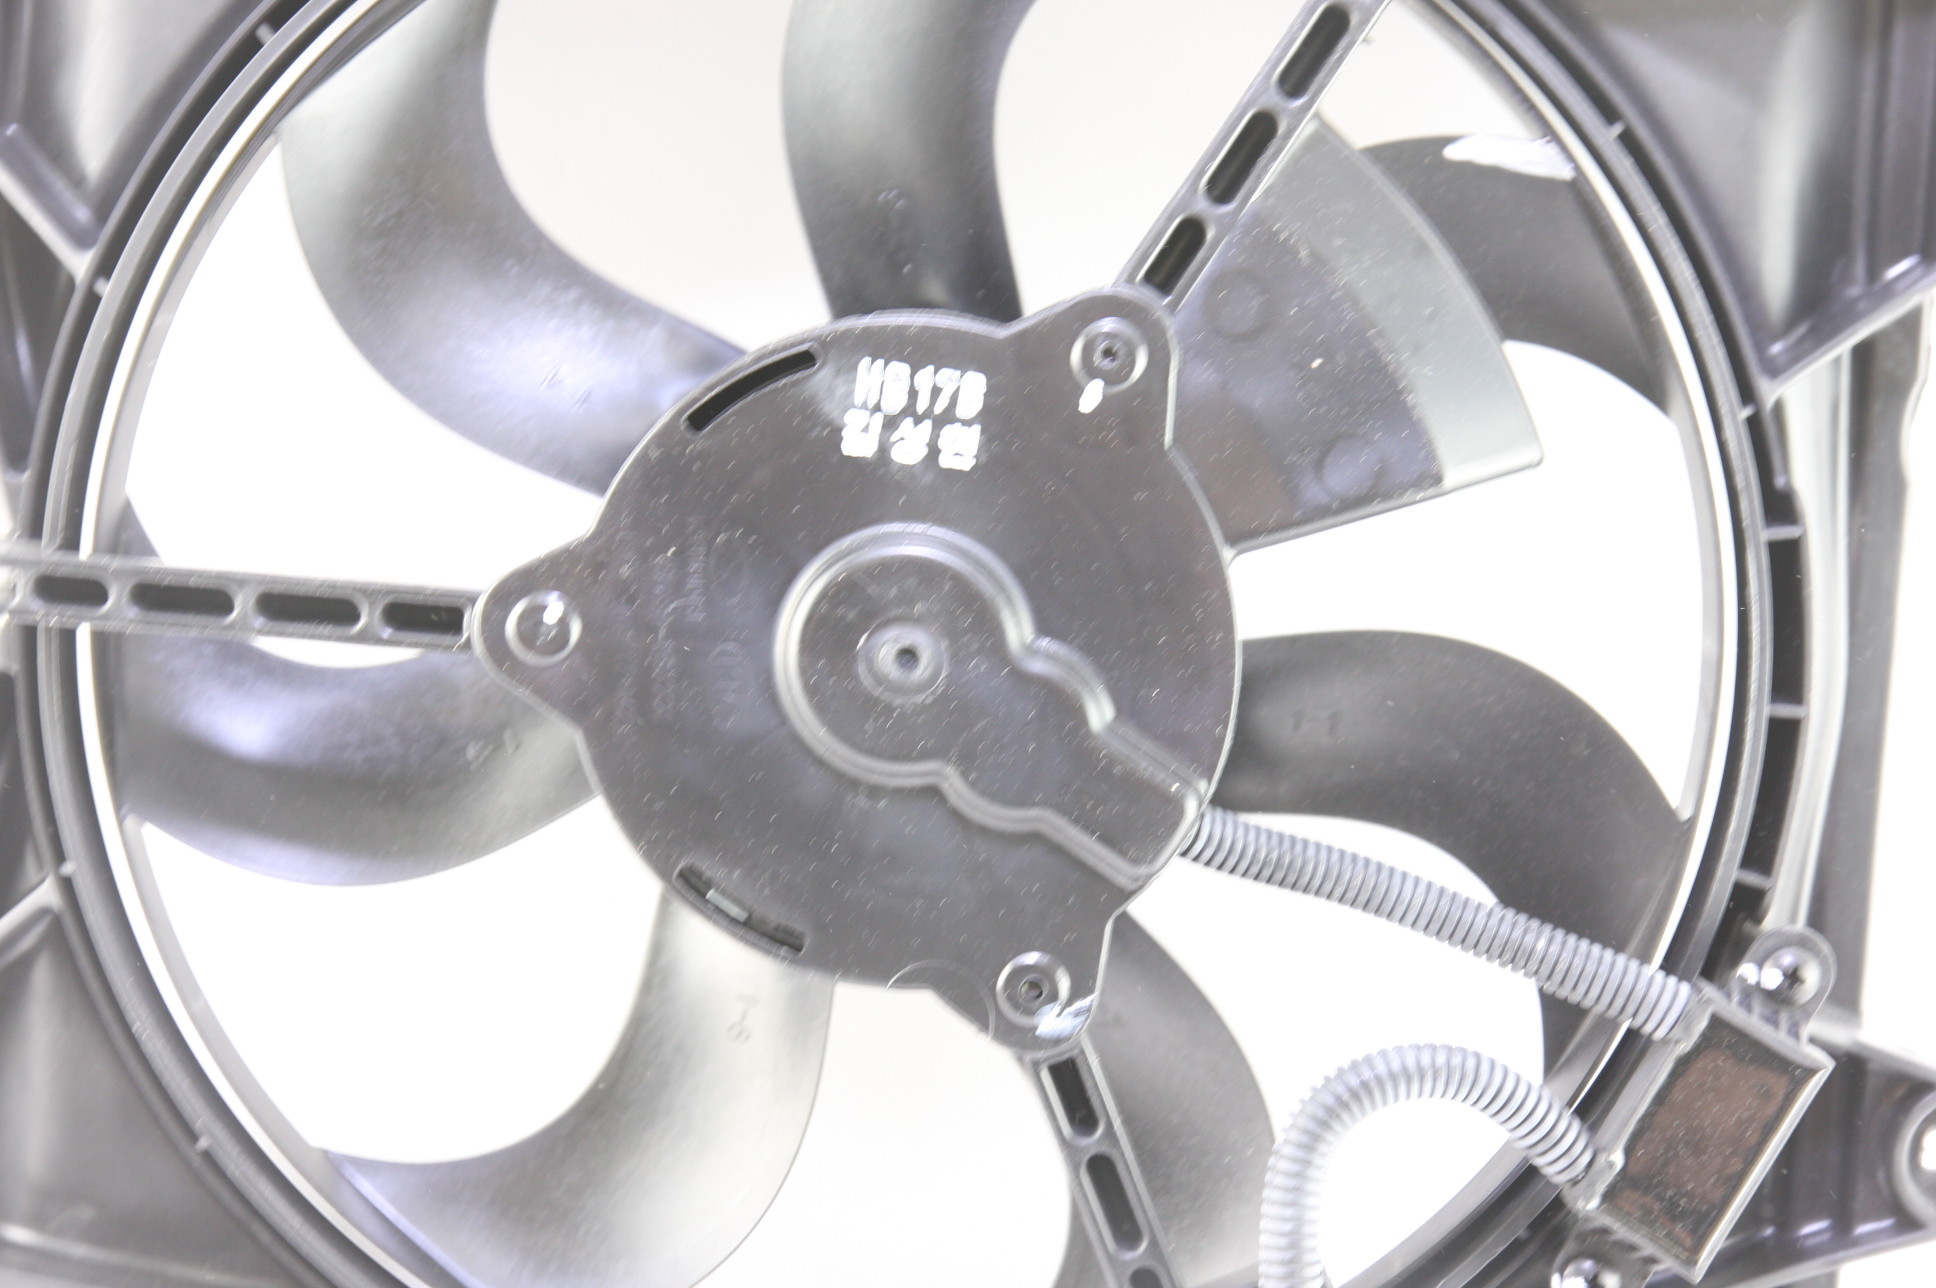 ~ New Kia OEM 977301G000 Kia Rio Radiator Condenser Fan Motor Free Shipping - image 9